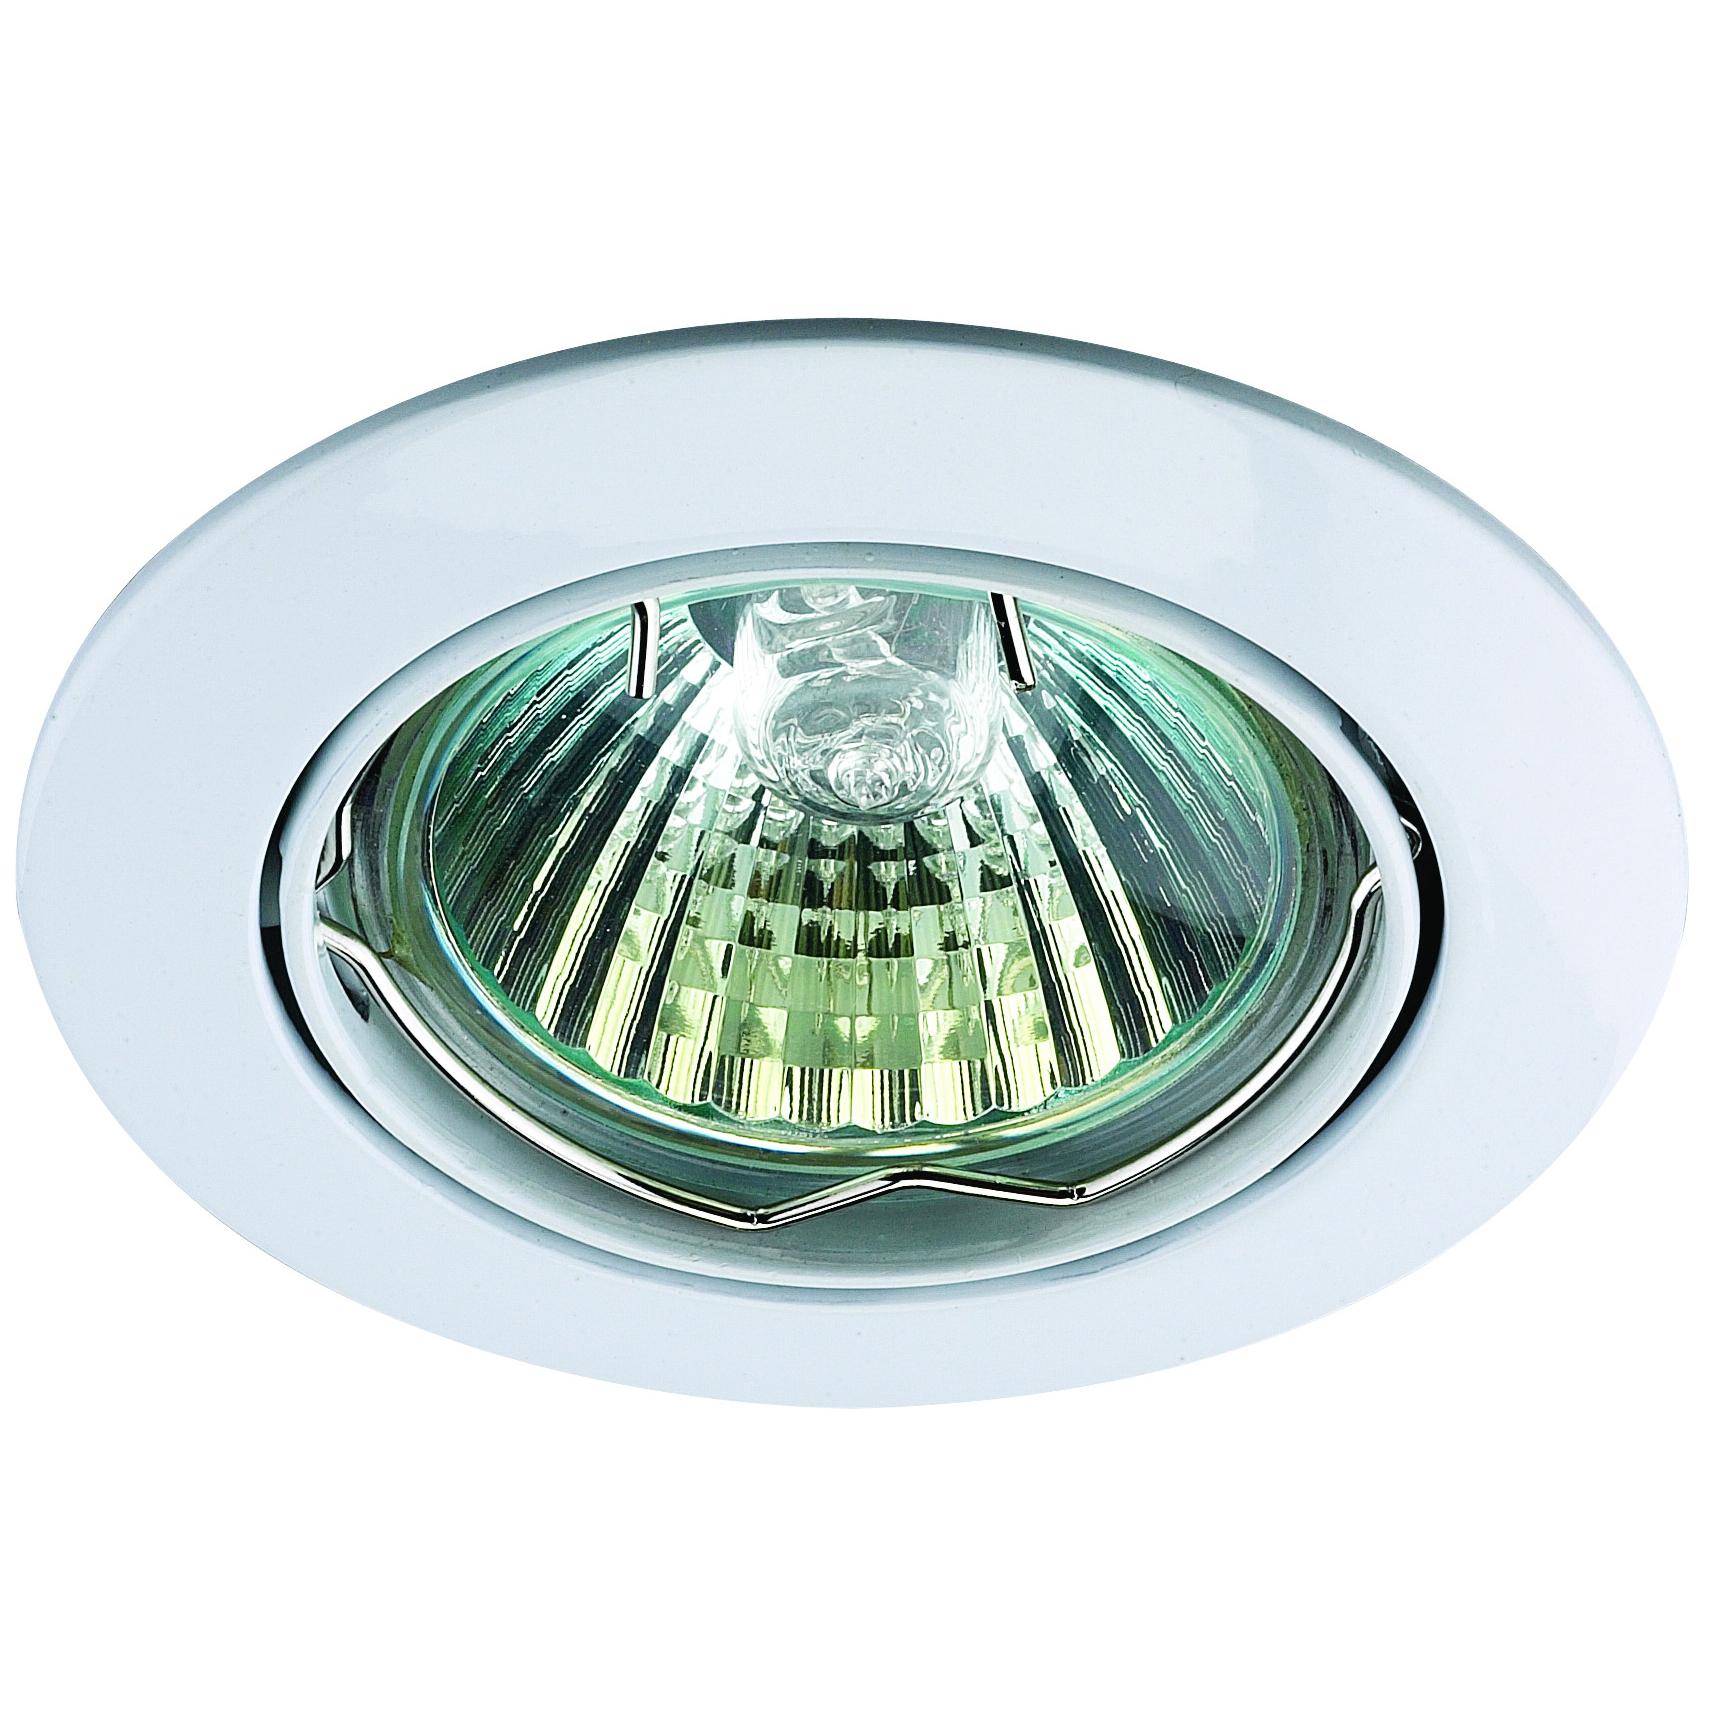 Светильник встраиваемый NovotechСветильники встраиваемые<br>Стиль светильника: модерн,<br>Диаметр: 82,<br>Форма светильника: круг,<br>Материал светильника: металл,<br>Количество ламп: 1,<br>Тип лампы: галогенная,<br>Мощность: 50,<br>Патрон: GX5.3,<br>Цвет арматуры: белый,<br>Назначение светильника: для комнаты<br>